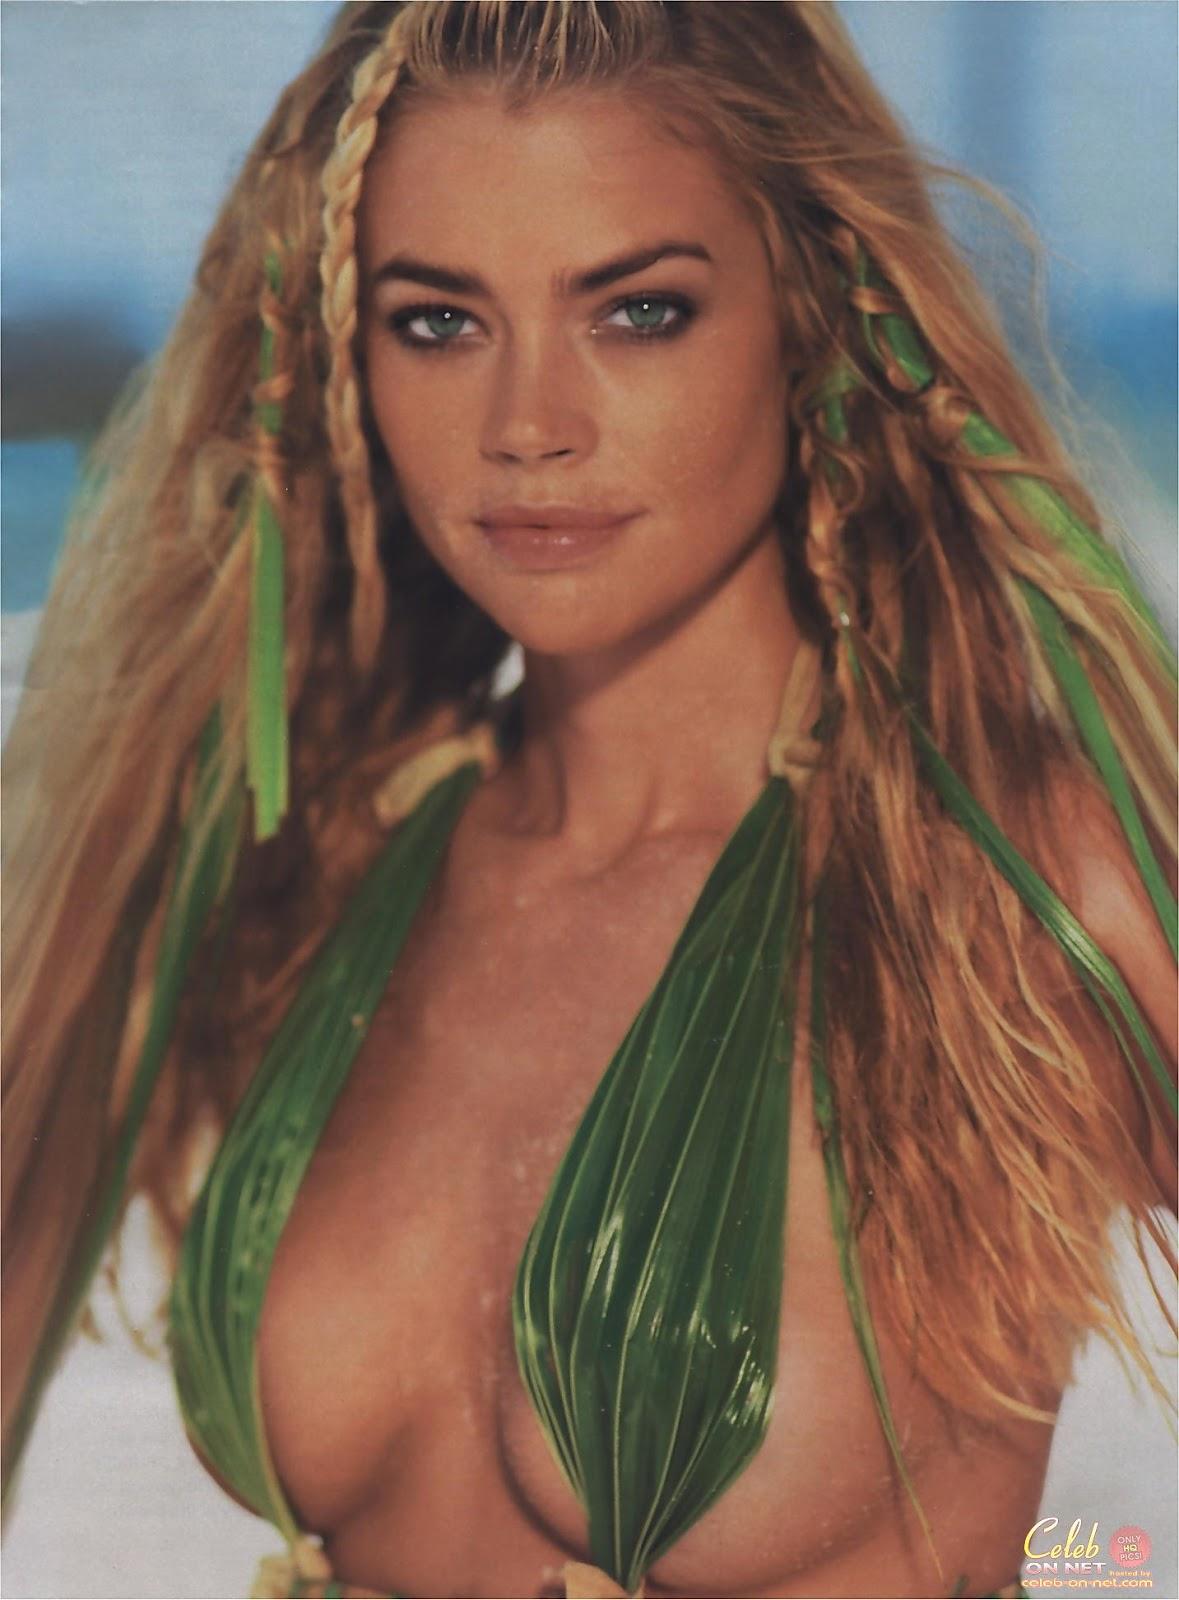 Tracey edmonds bikini